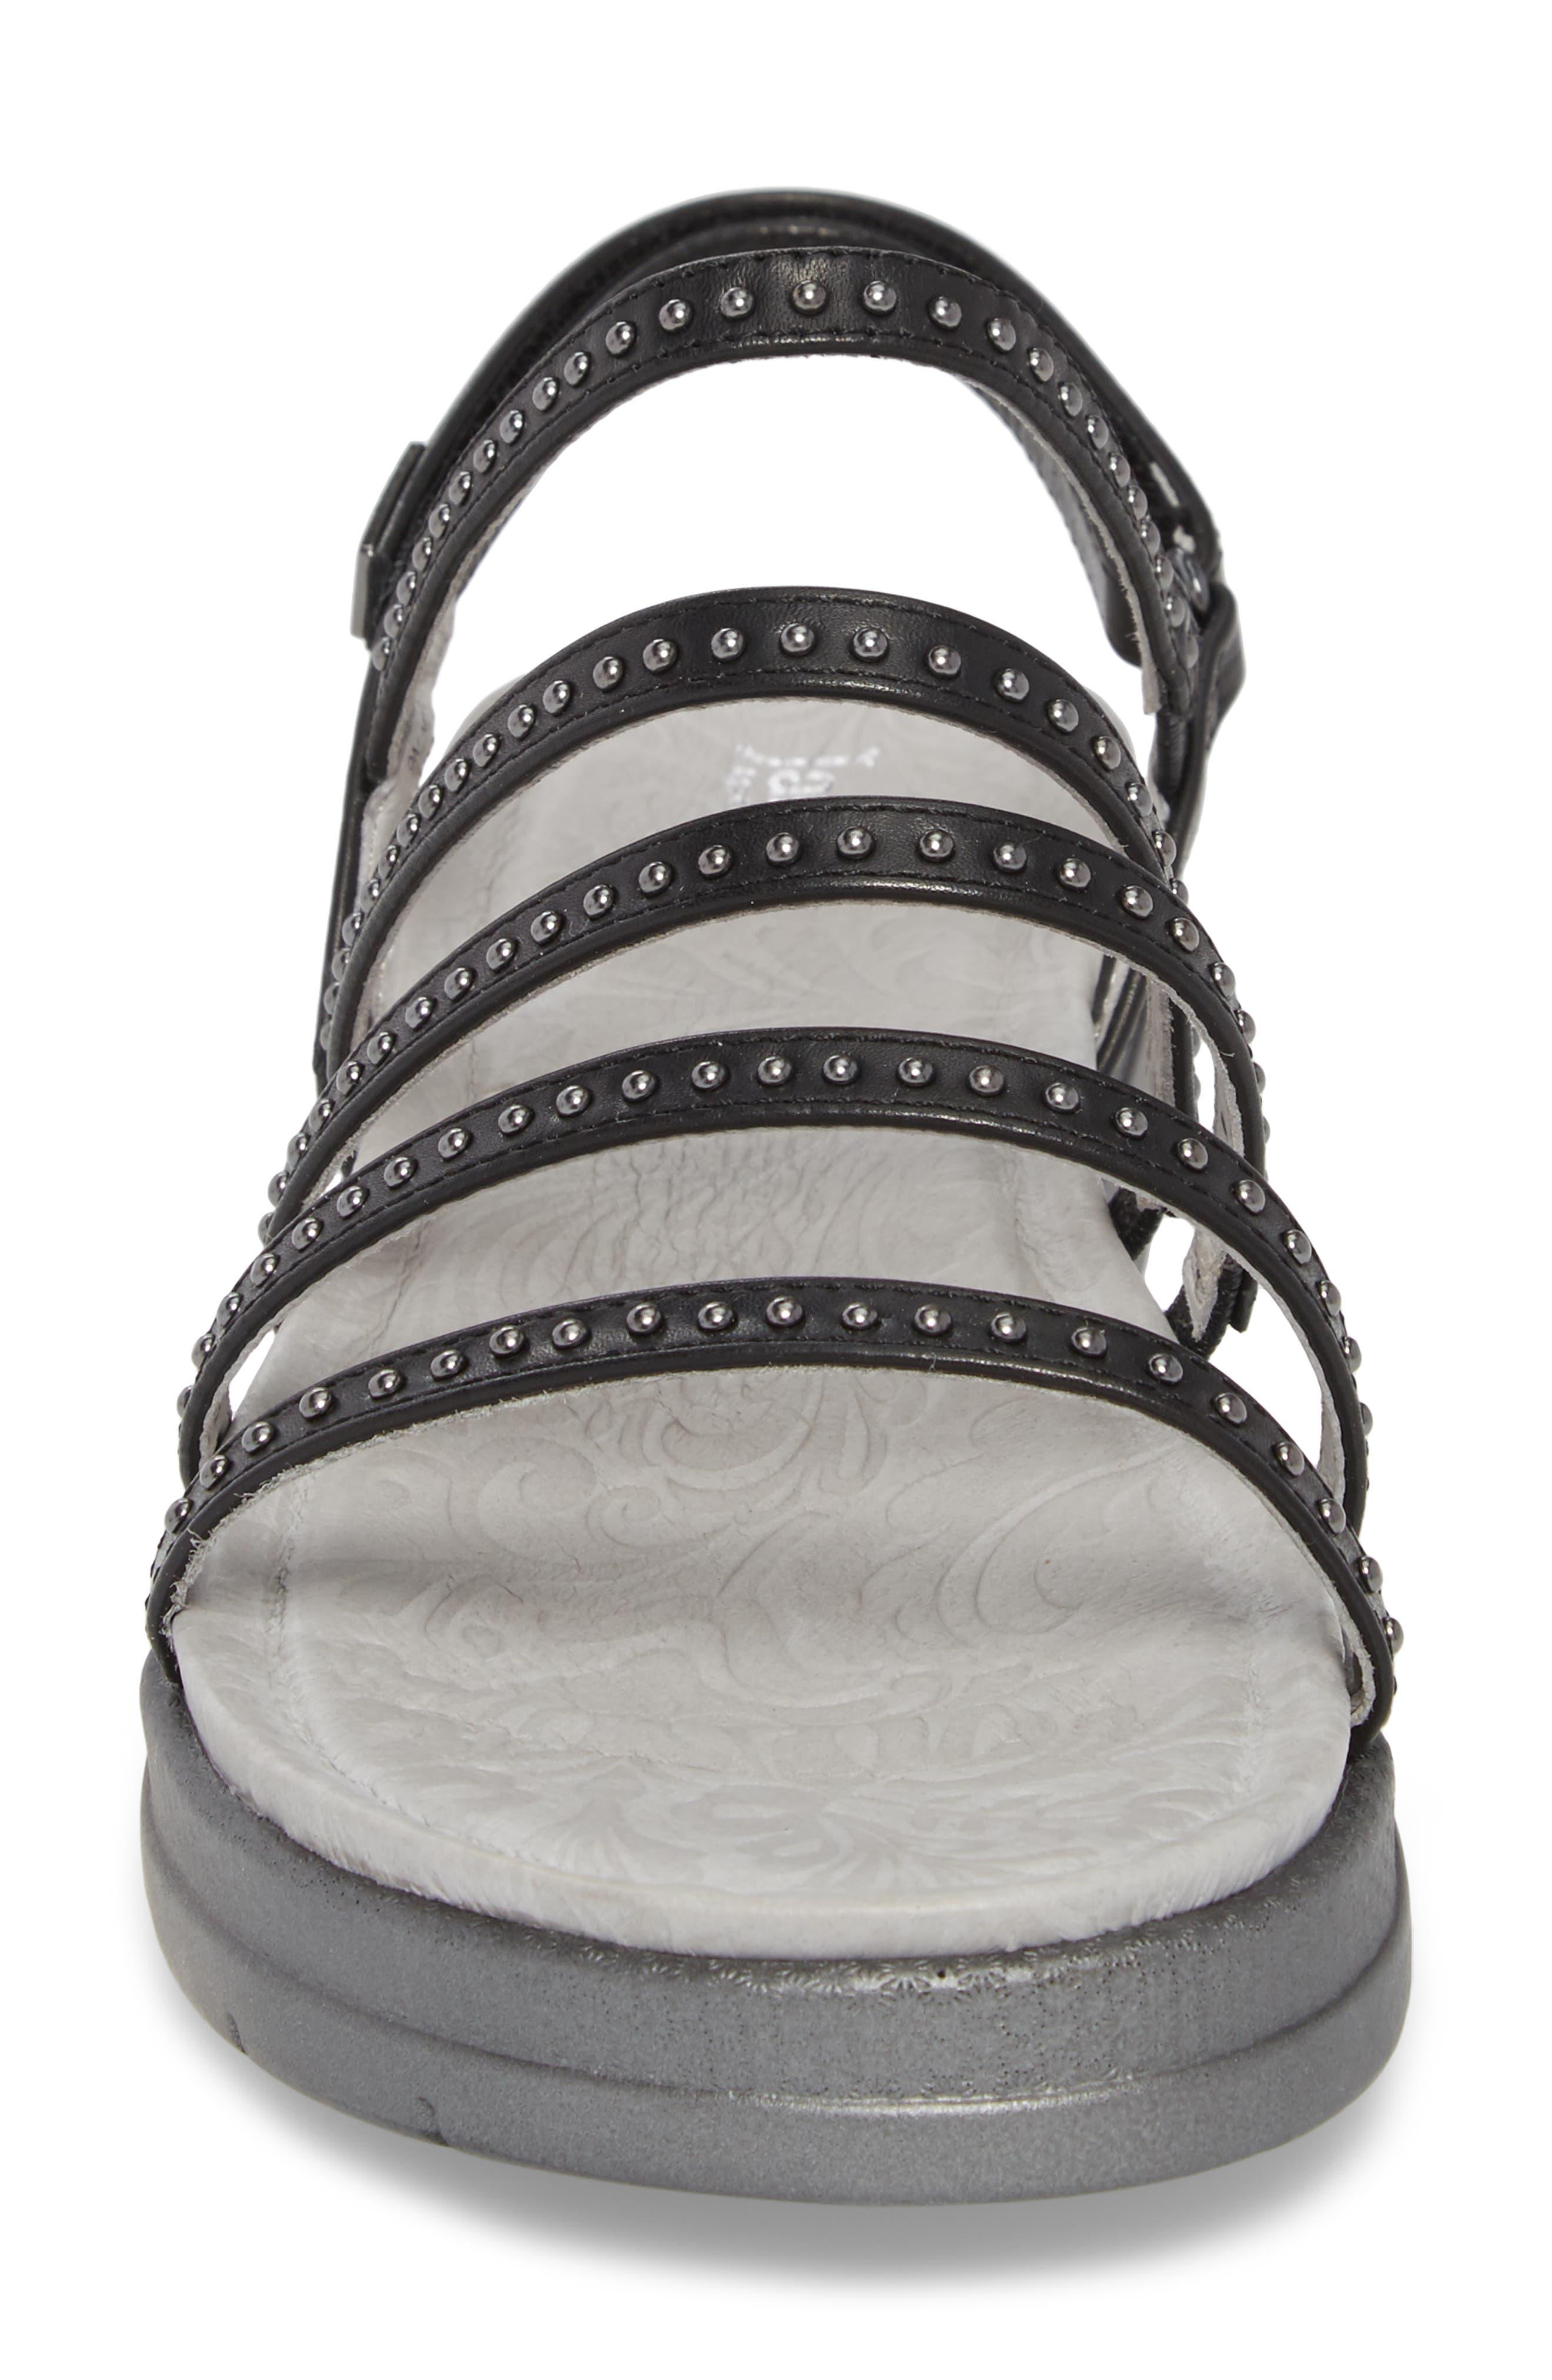 Elegance Studded Strappy Sandal,                             Alternate thumbnail 4, color,                             BLACK LEATHER